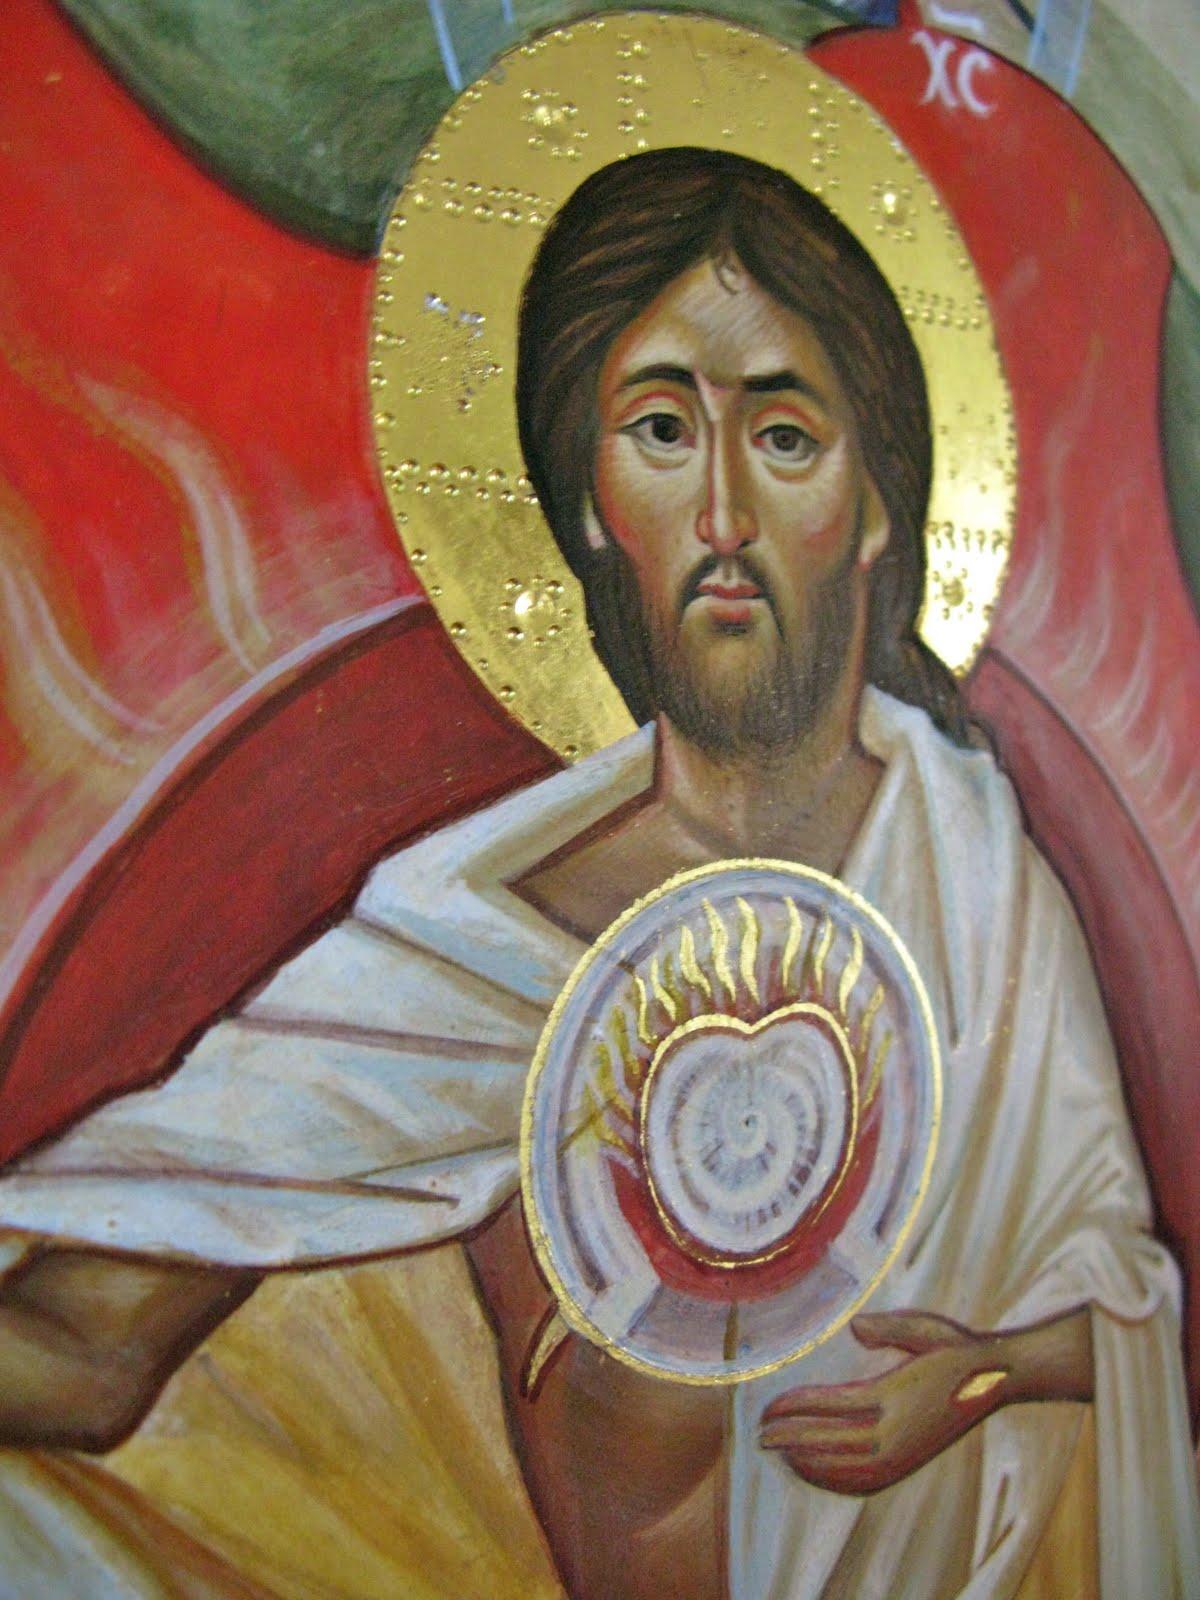 Sacred Heart of Jesus dans immagini sacre sh+angle